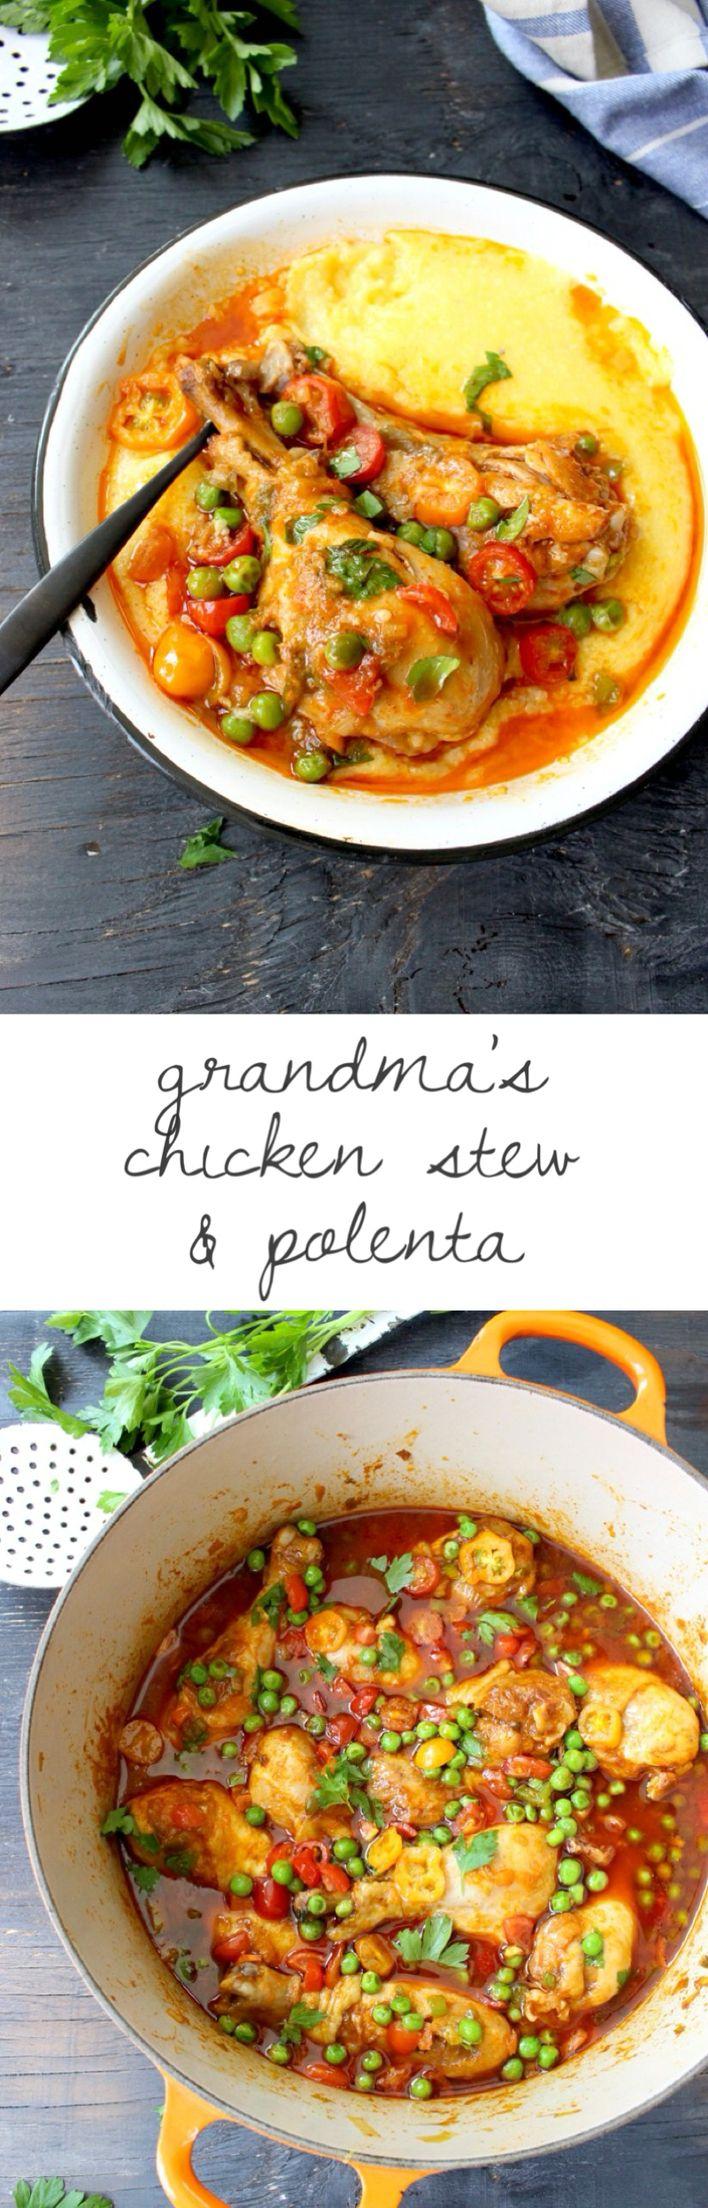 Easy Chicken Stew (Grandma's Recipe for Chicken Stew ) | CiaoFlorentina.com @CiaoFlorentina